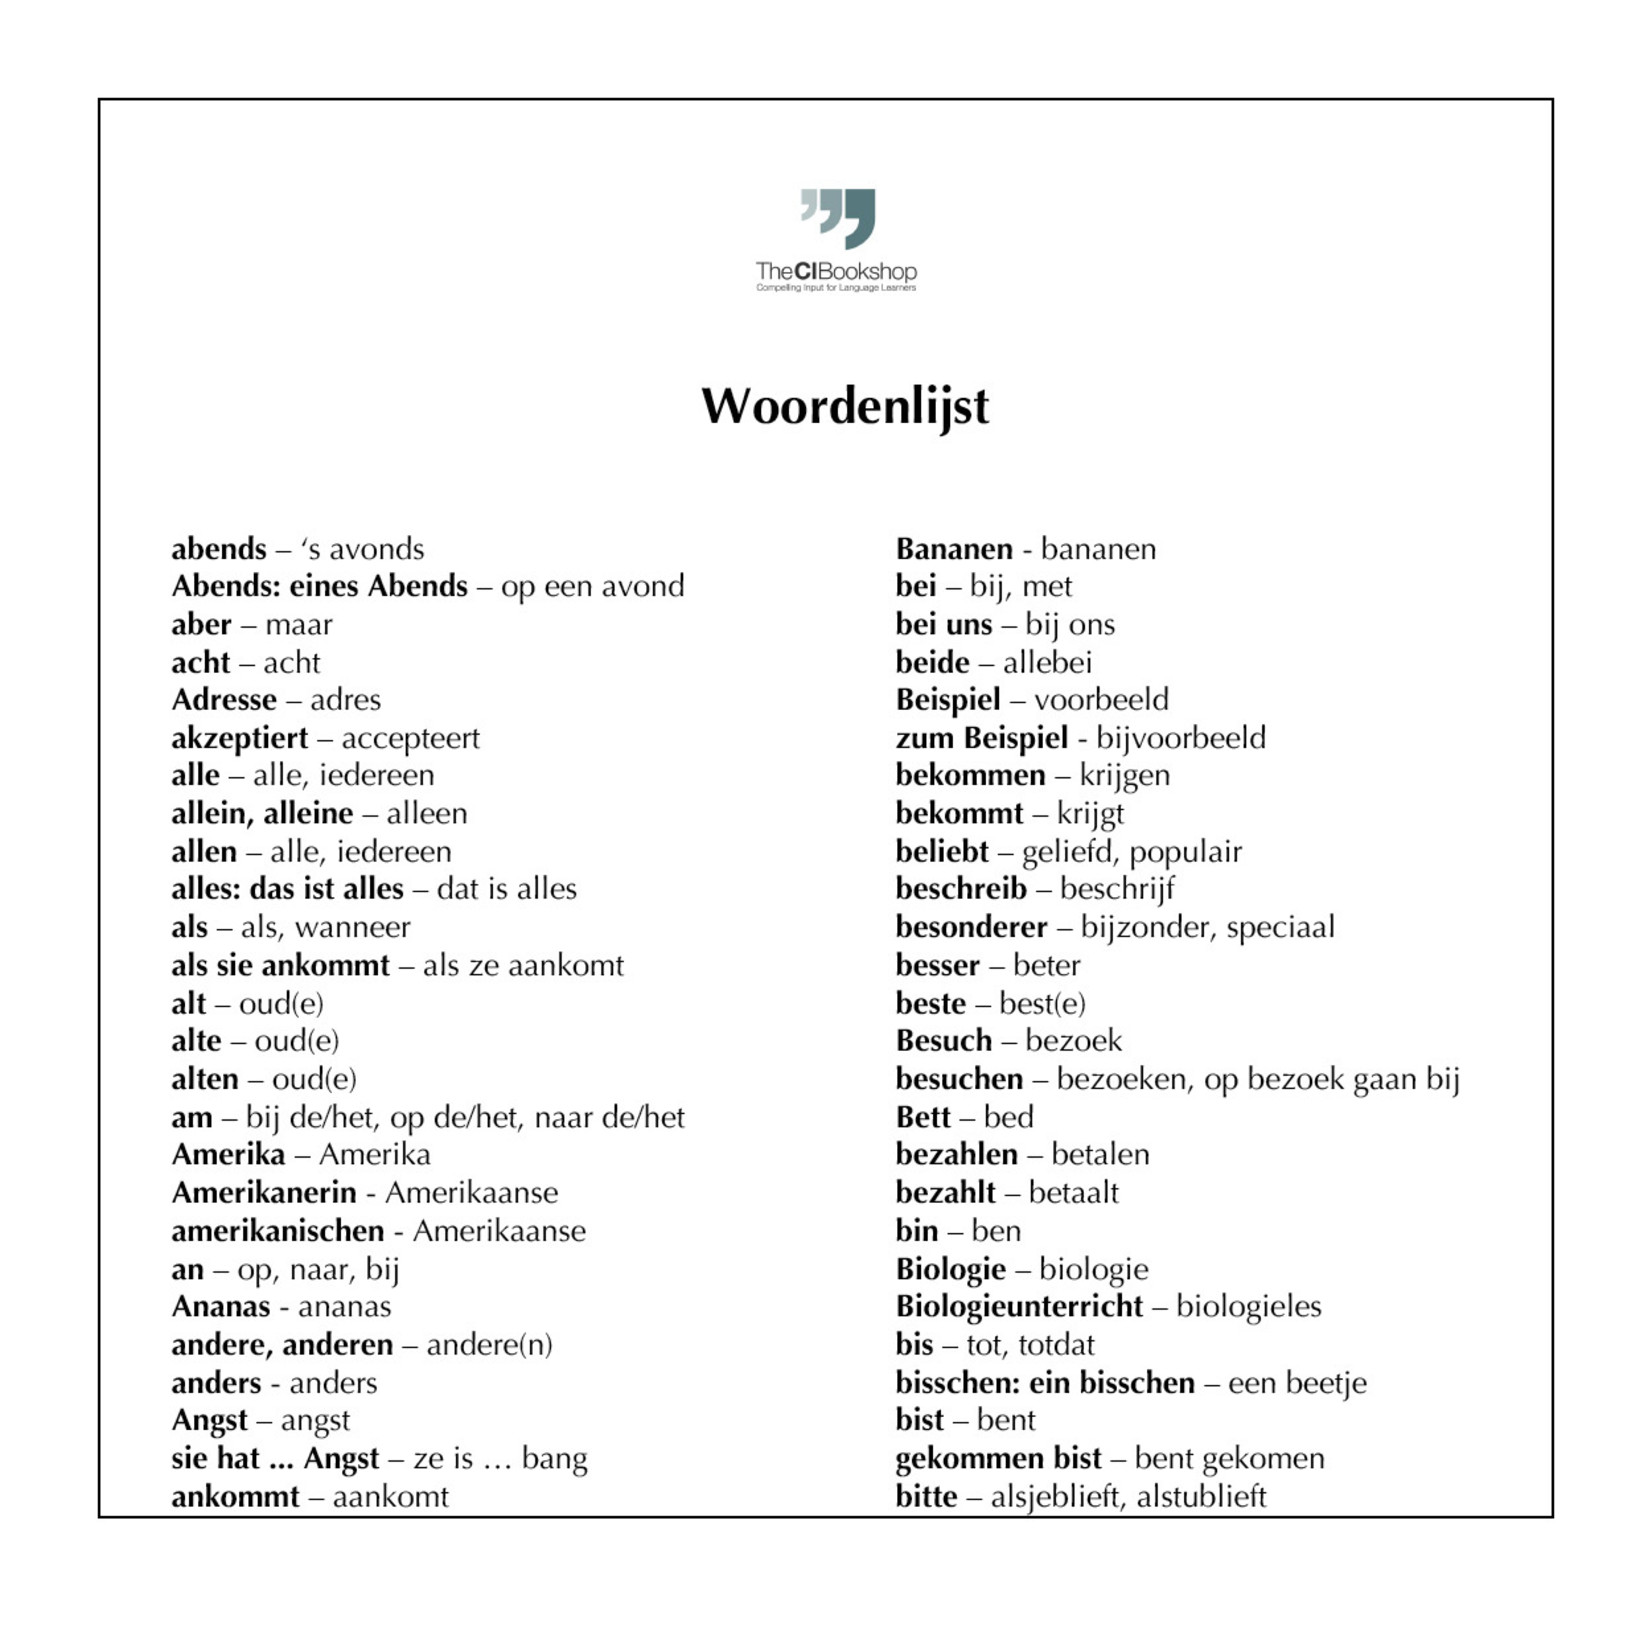 Dutch glossary for Nordseepirat